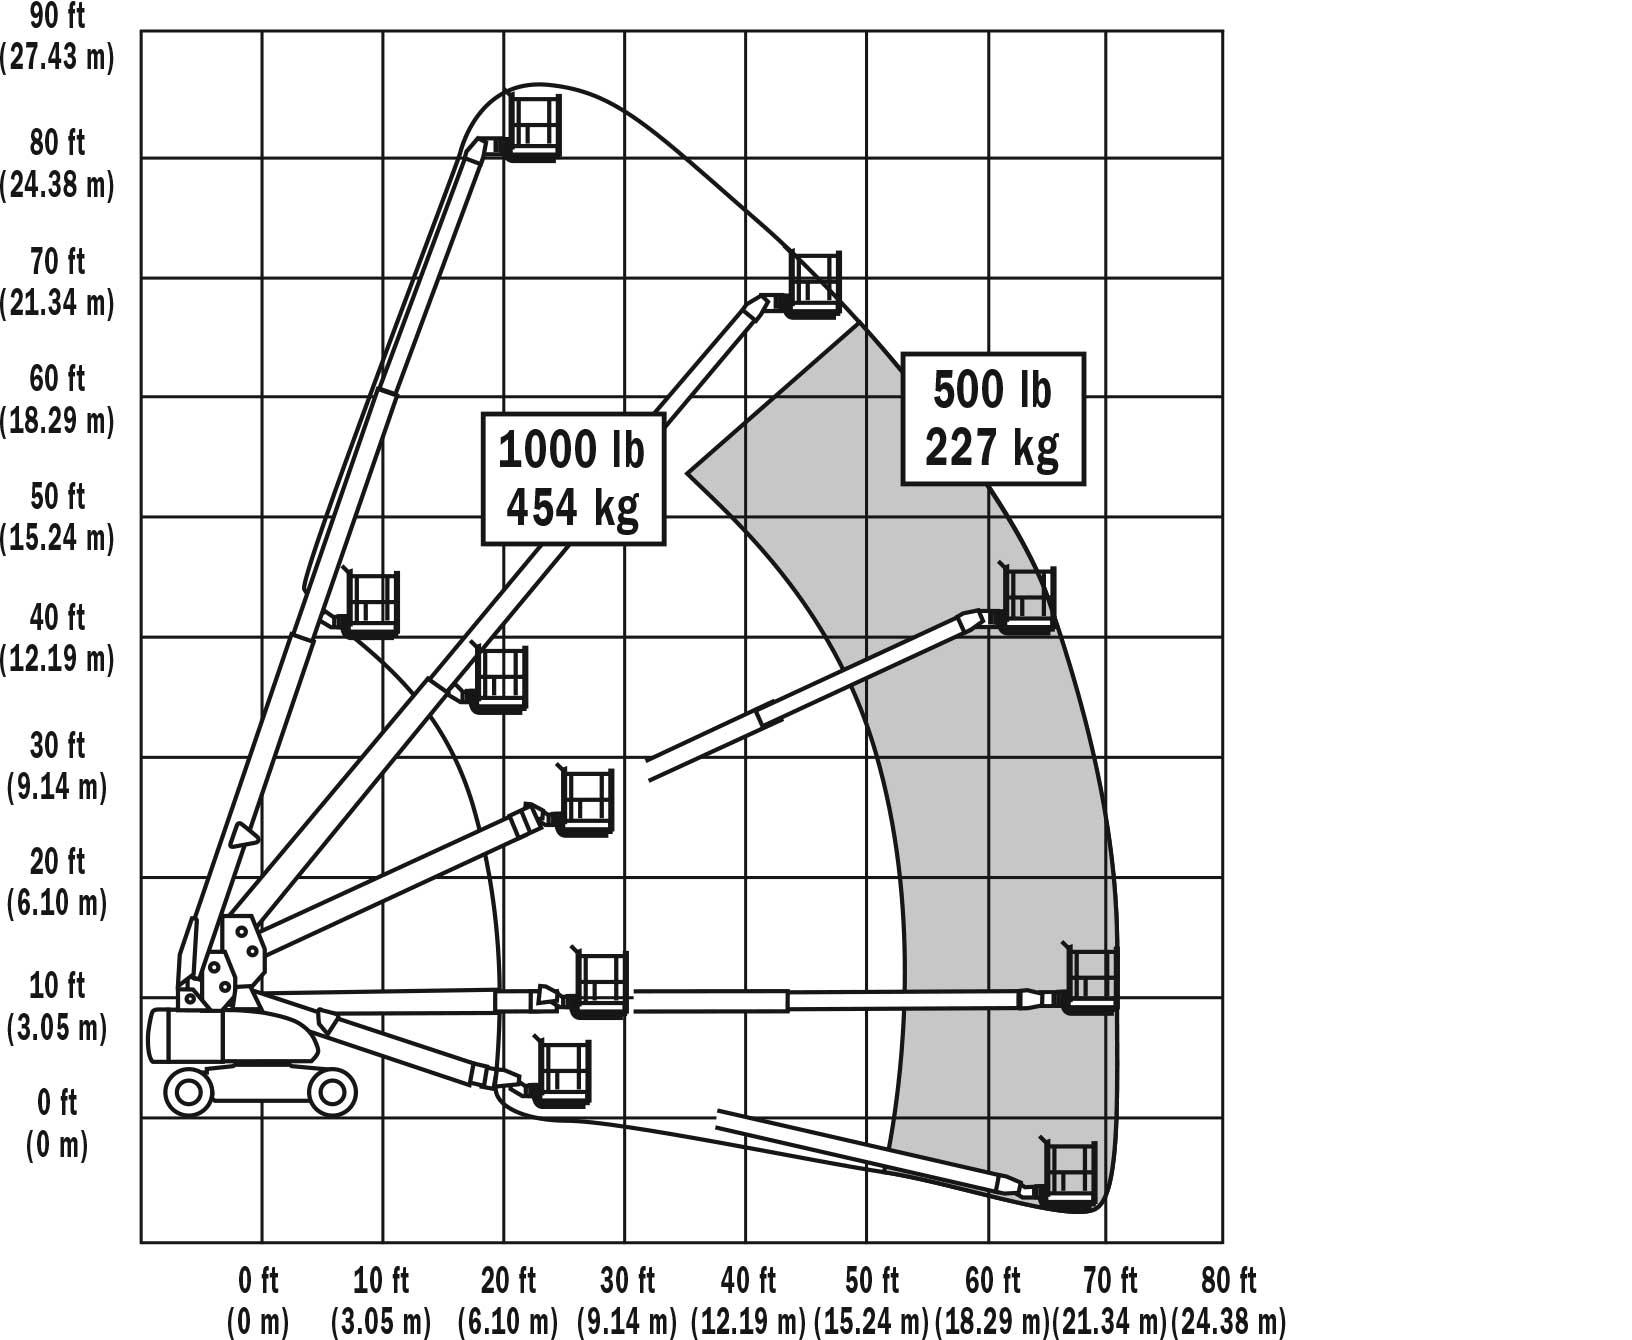 Boom Lift Diagram | Wiring Diagram Jlg H Man Lift Wiring Diagram on